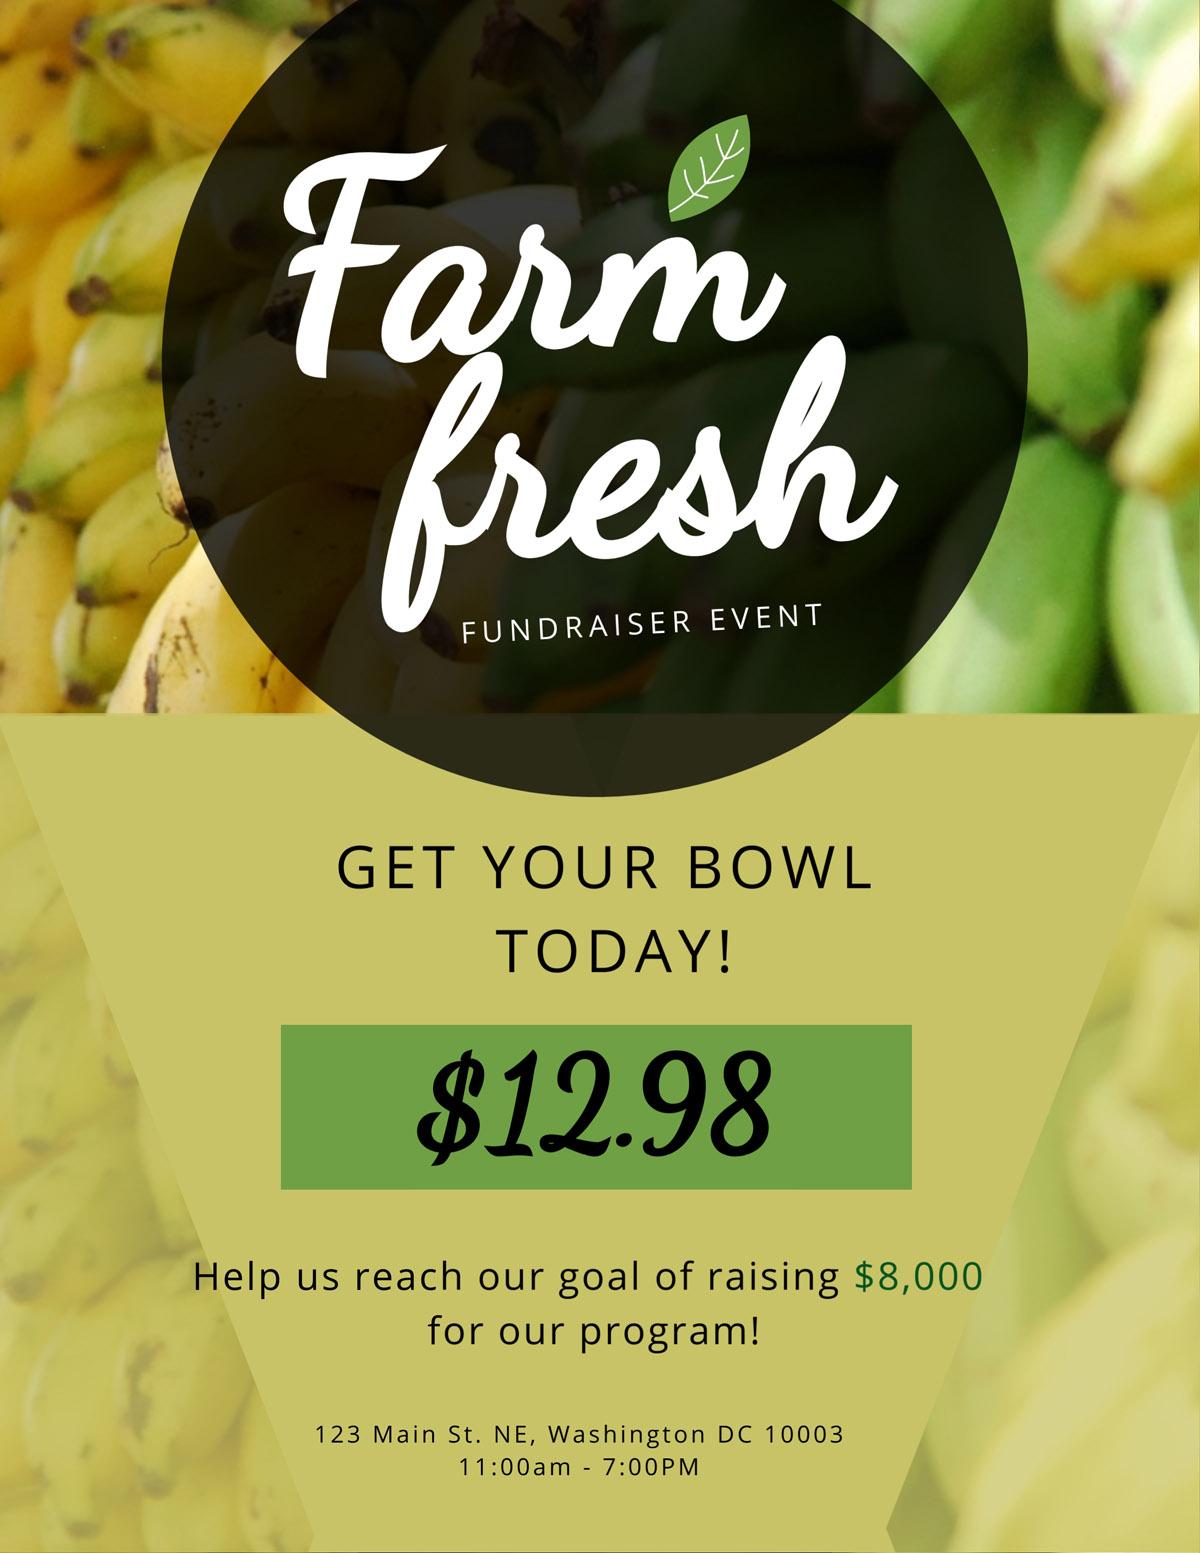 flyer templates - farm fresh fundraiser